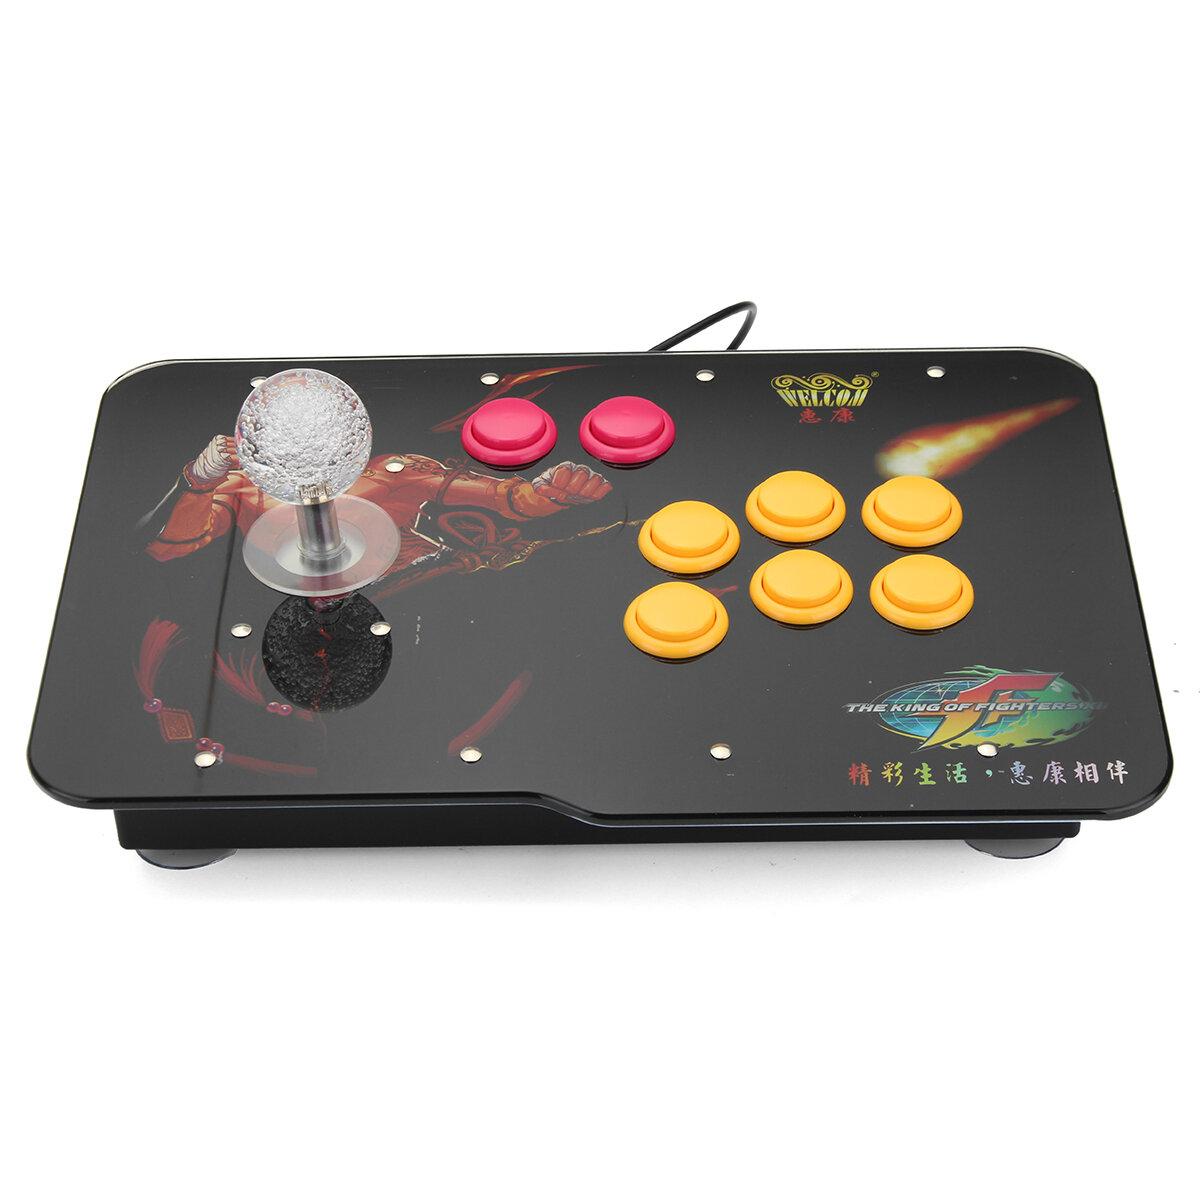 arcade stick video game led light usb joystick controller ...